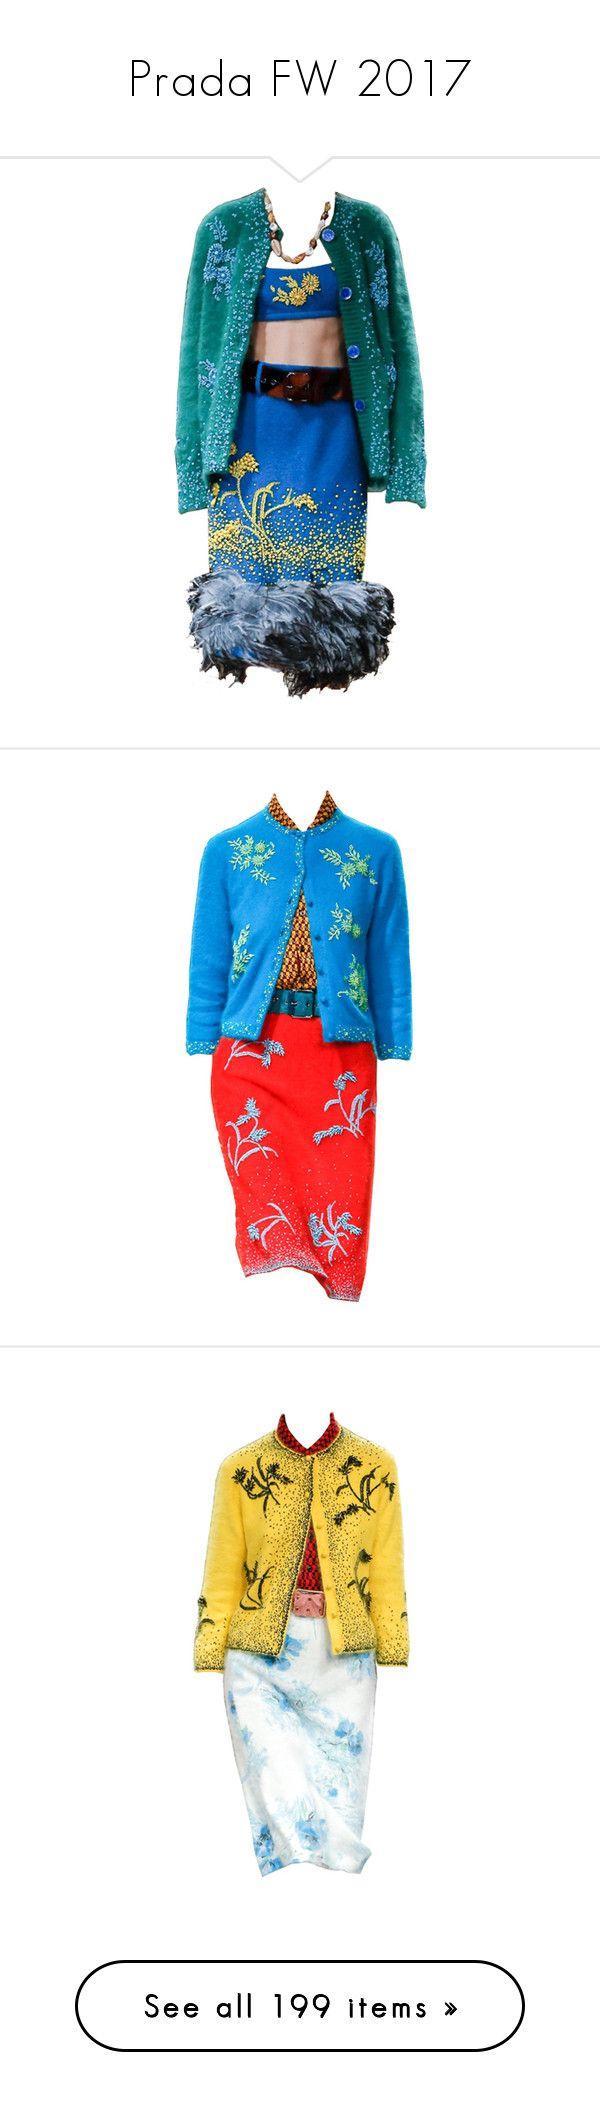 """Prada FW 2017"" by sella103 ❤ liked on Polyvore featuring dresses, prada, knee-length, multicoloured, no sleeve dress, multi coloured dress, multi colored dress, colorful dresses, multicolor dresses and vegan dresses"